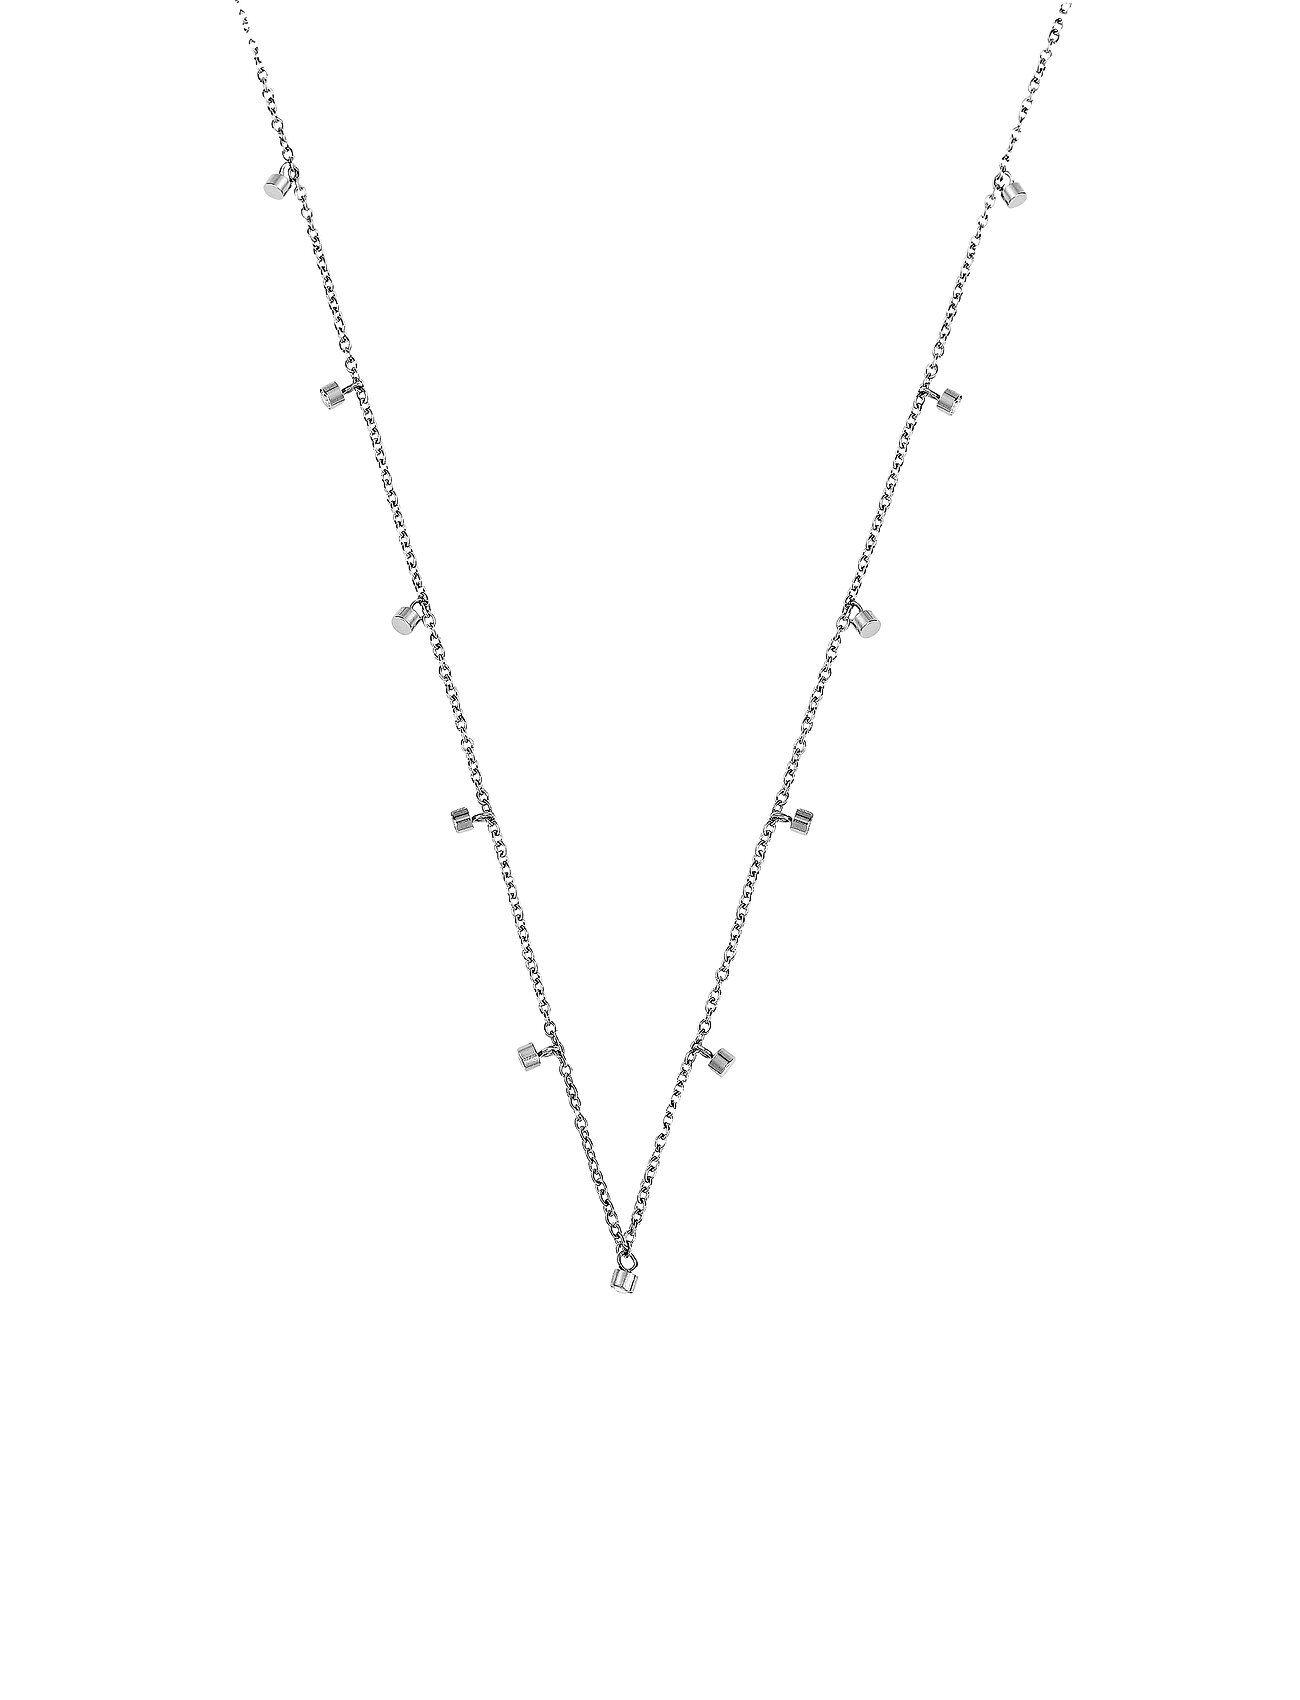 Edblad Tina Necklace Steel Accessories Jewellery Necklaces Dainty Necklaces Hopea Edblad